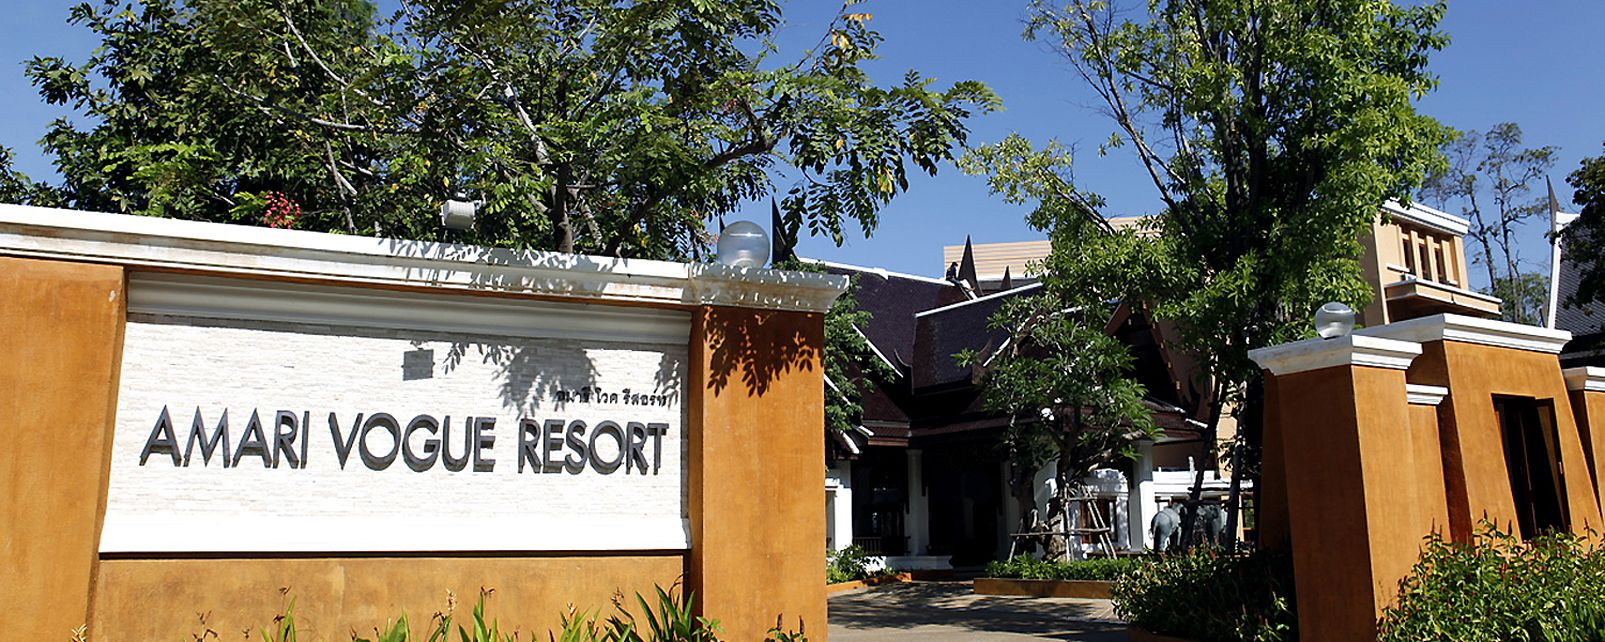 Hôtel Amari Vogue Resort